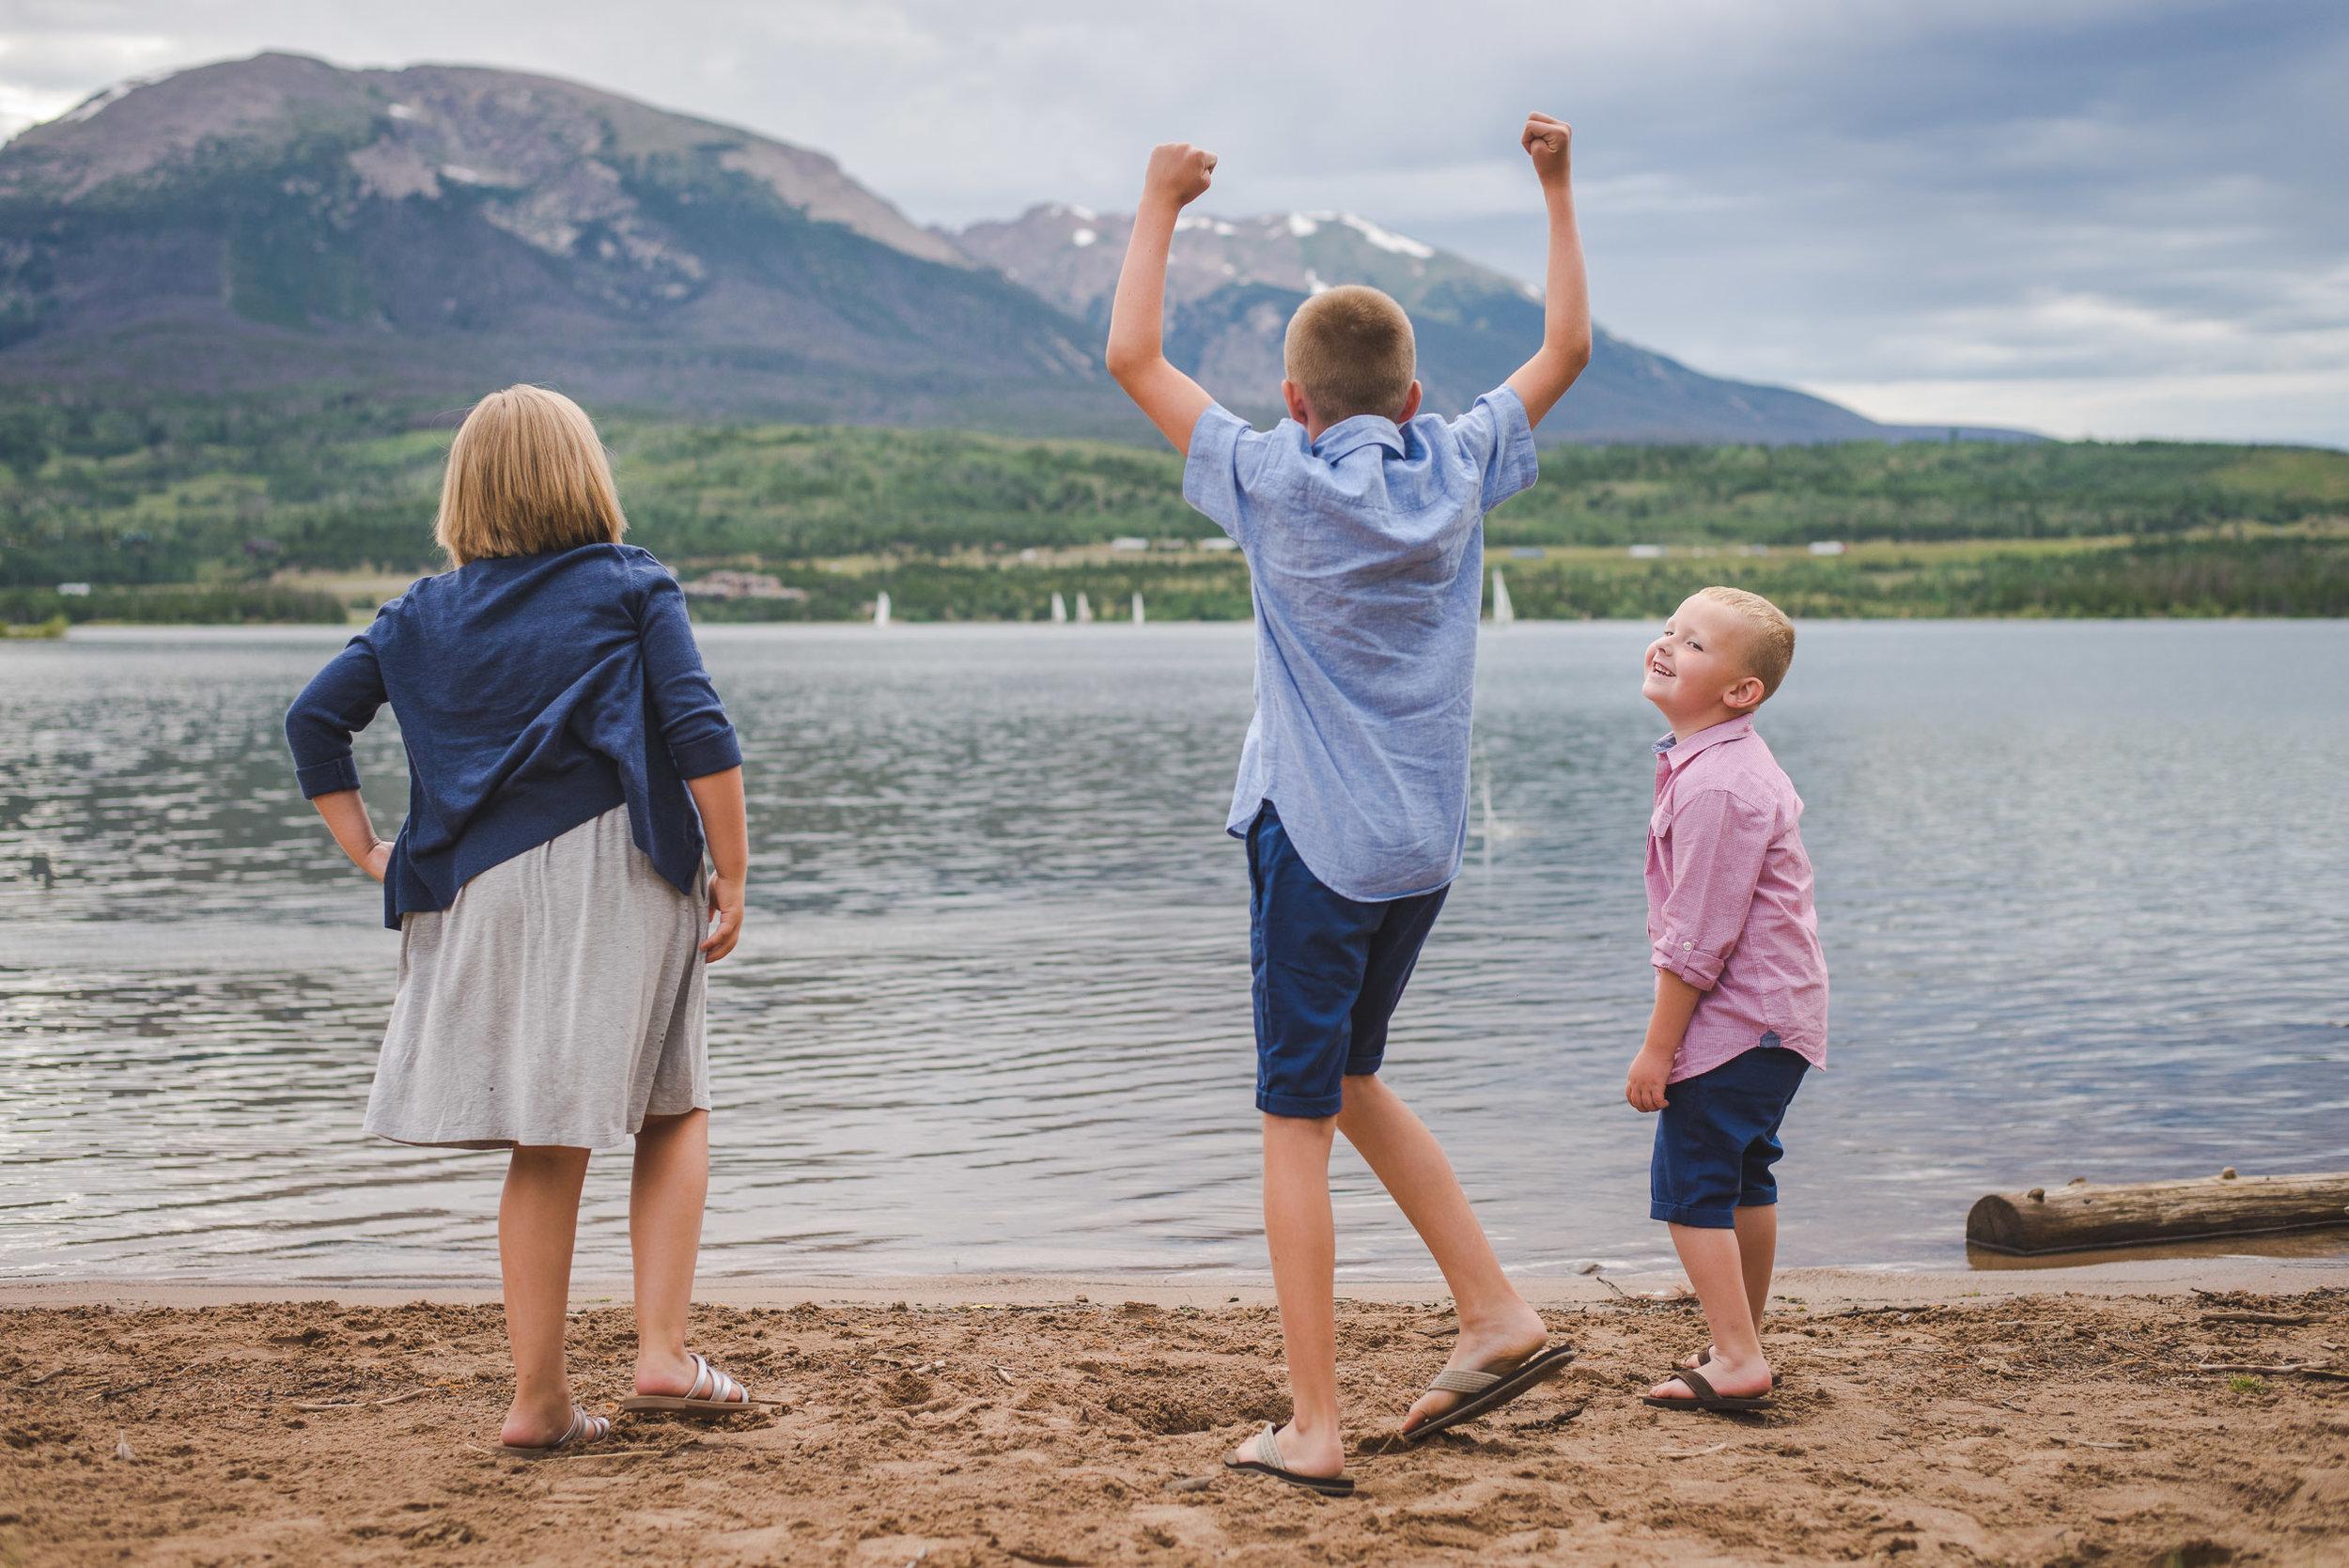 Summer Vacation Family Portraits at Lake Dillon and Frisco, Colorado | Keeping Composure Photography